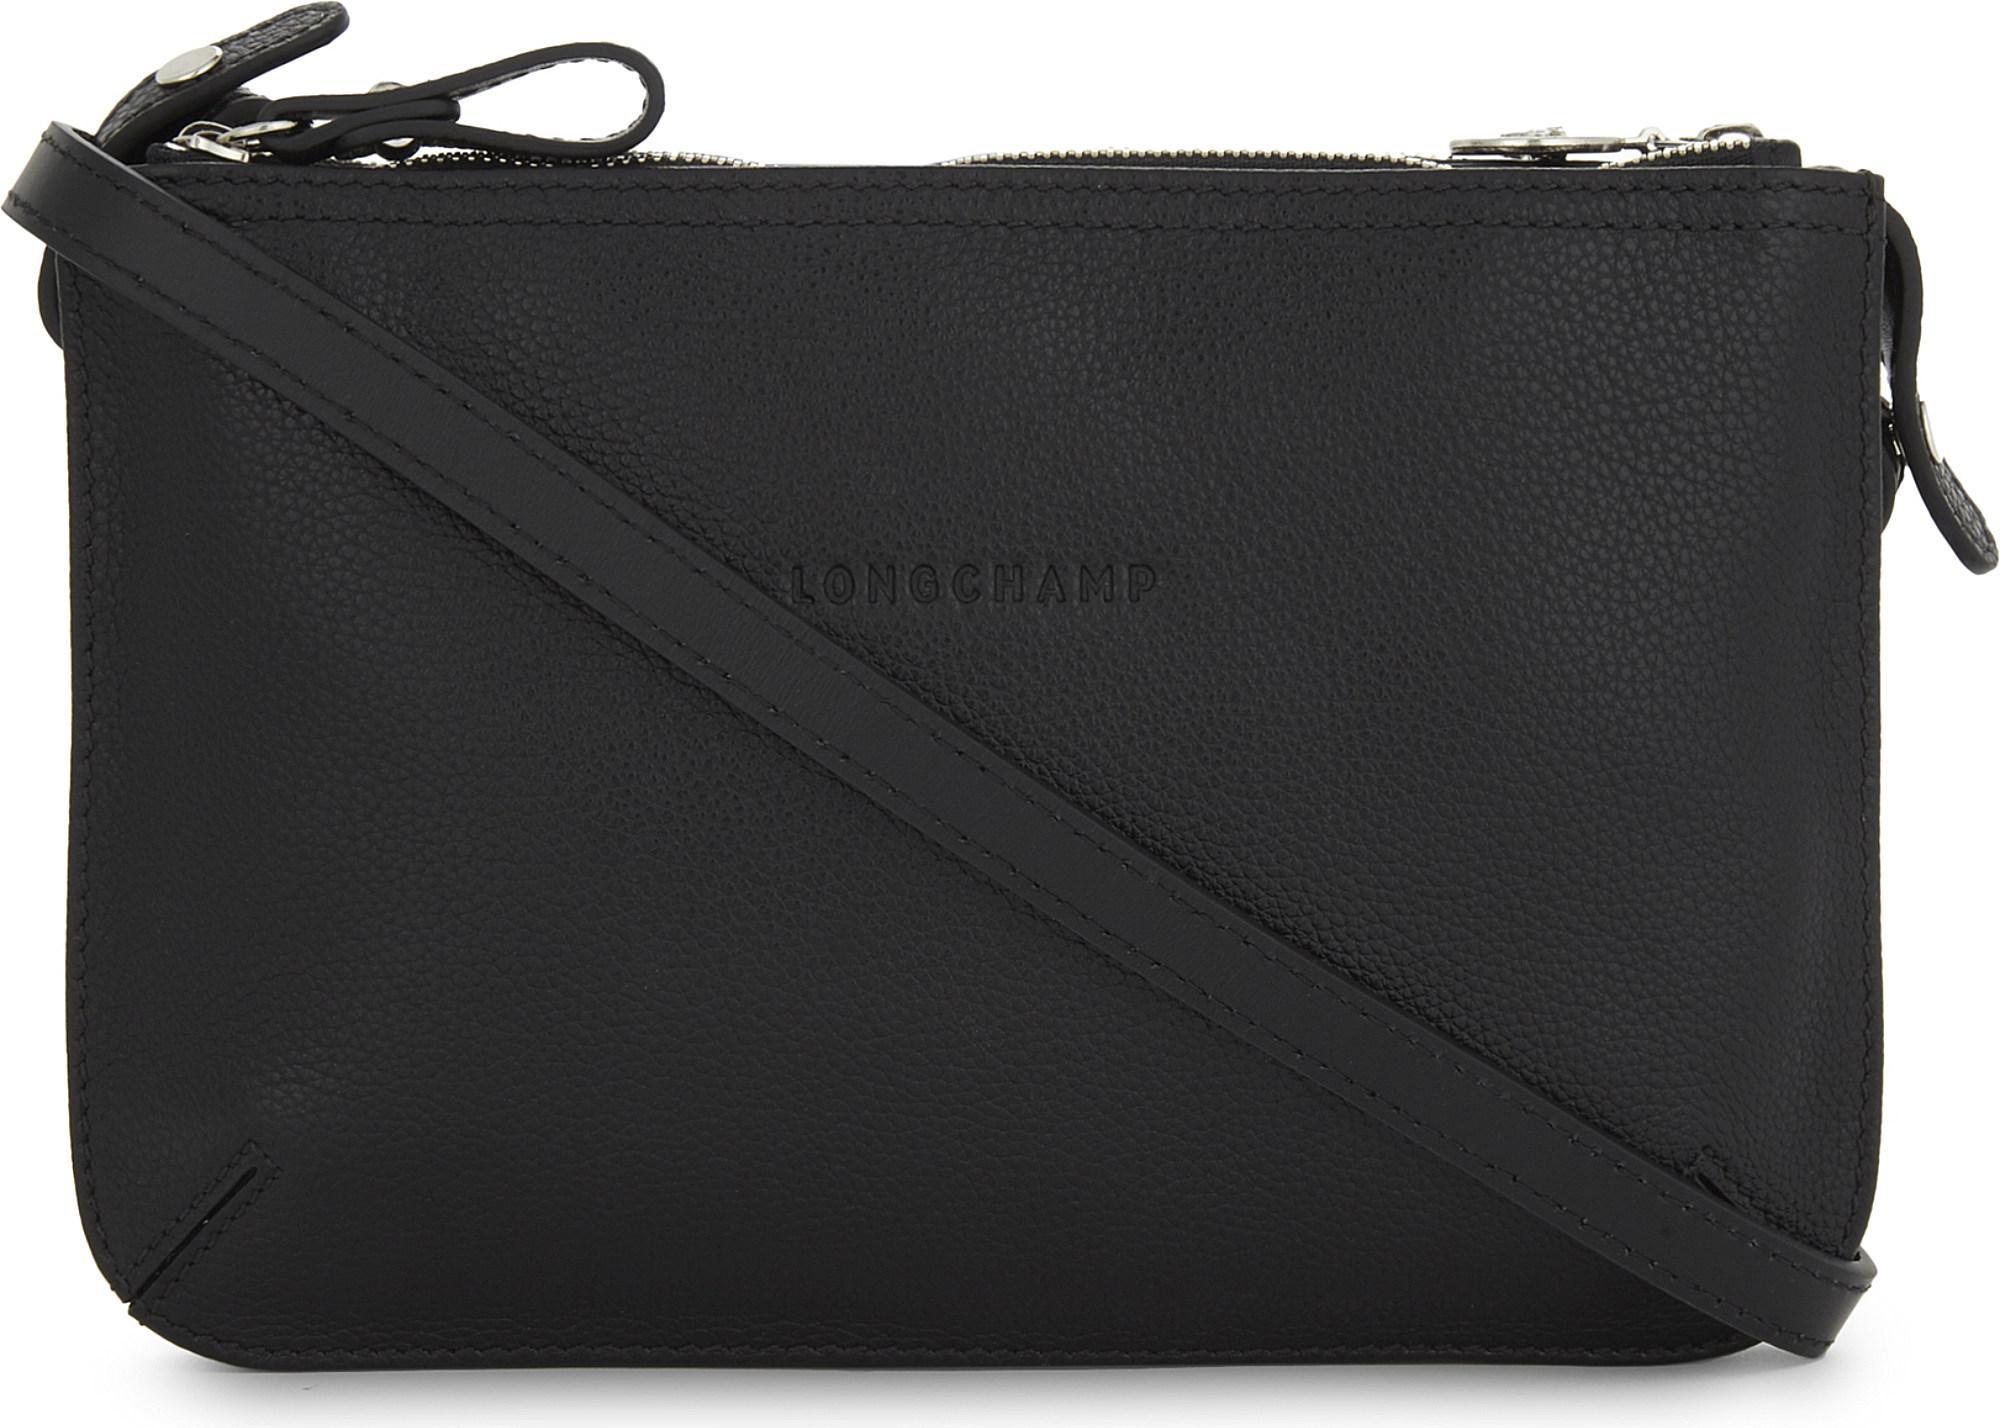 3f9bda2fddde Longchamp - Black Le Foulonne Grained Leather Cross-body Bag - Lyst. View  fullscreen